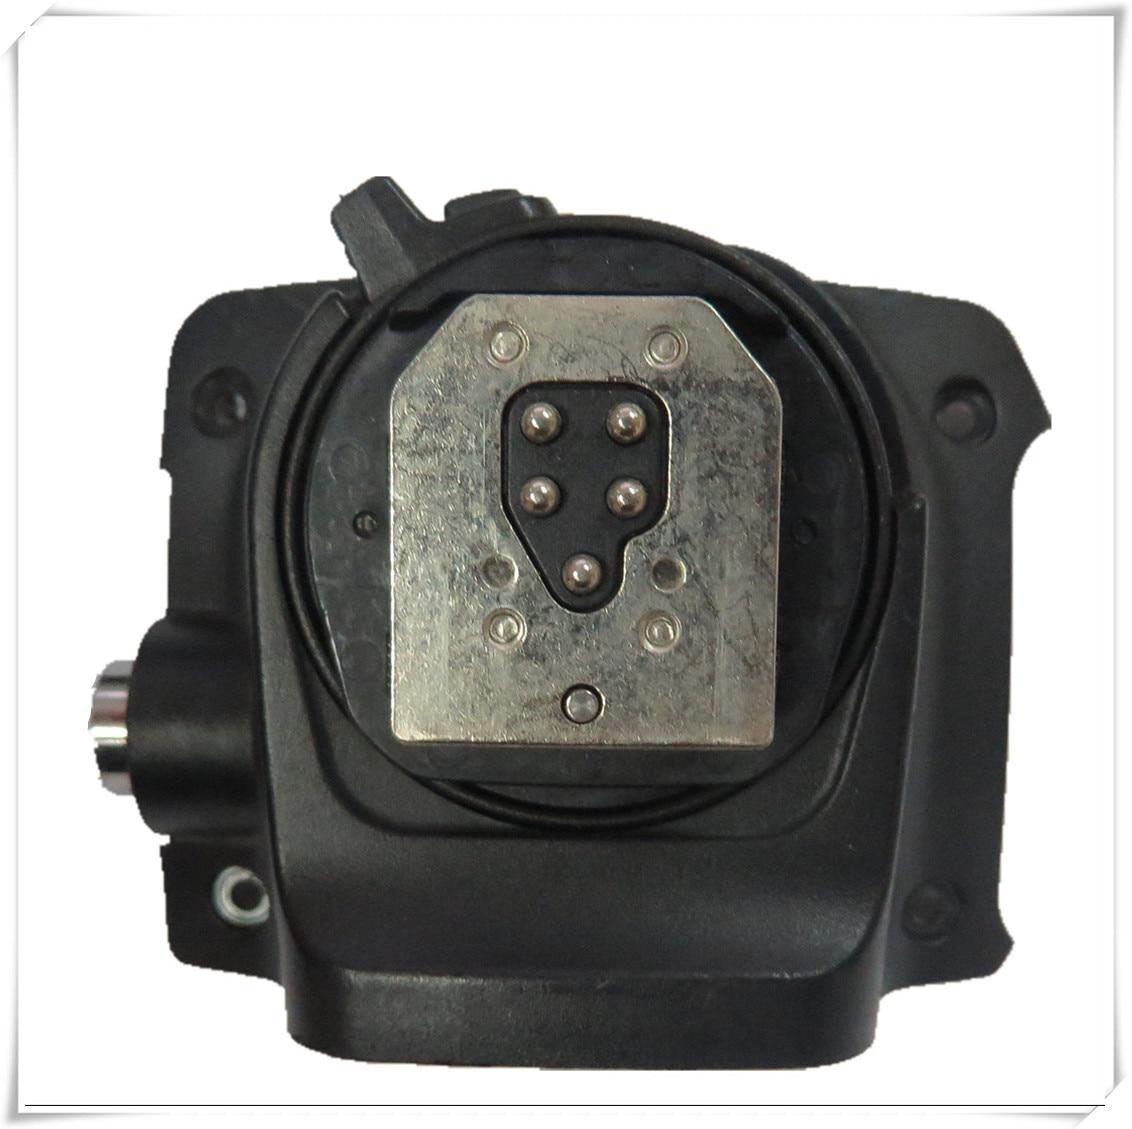 Original 580EX II hot shoe Flash Base for Canon 580ex ii Speedlight Flash Hotshoe Replacement Part Camera